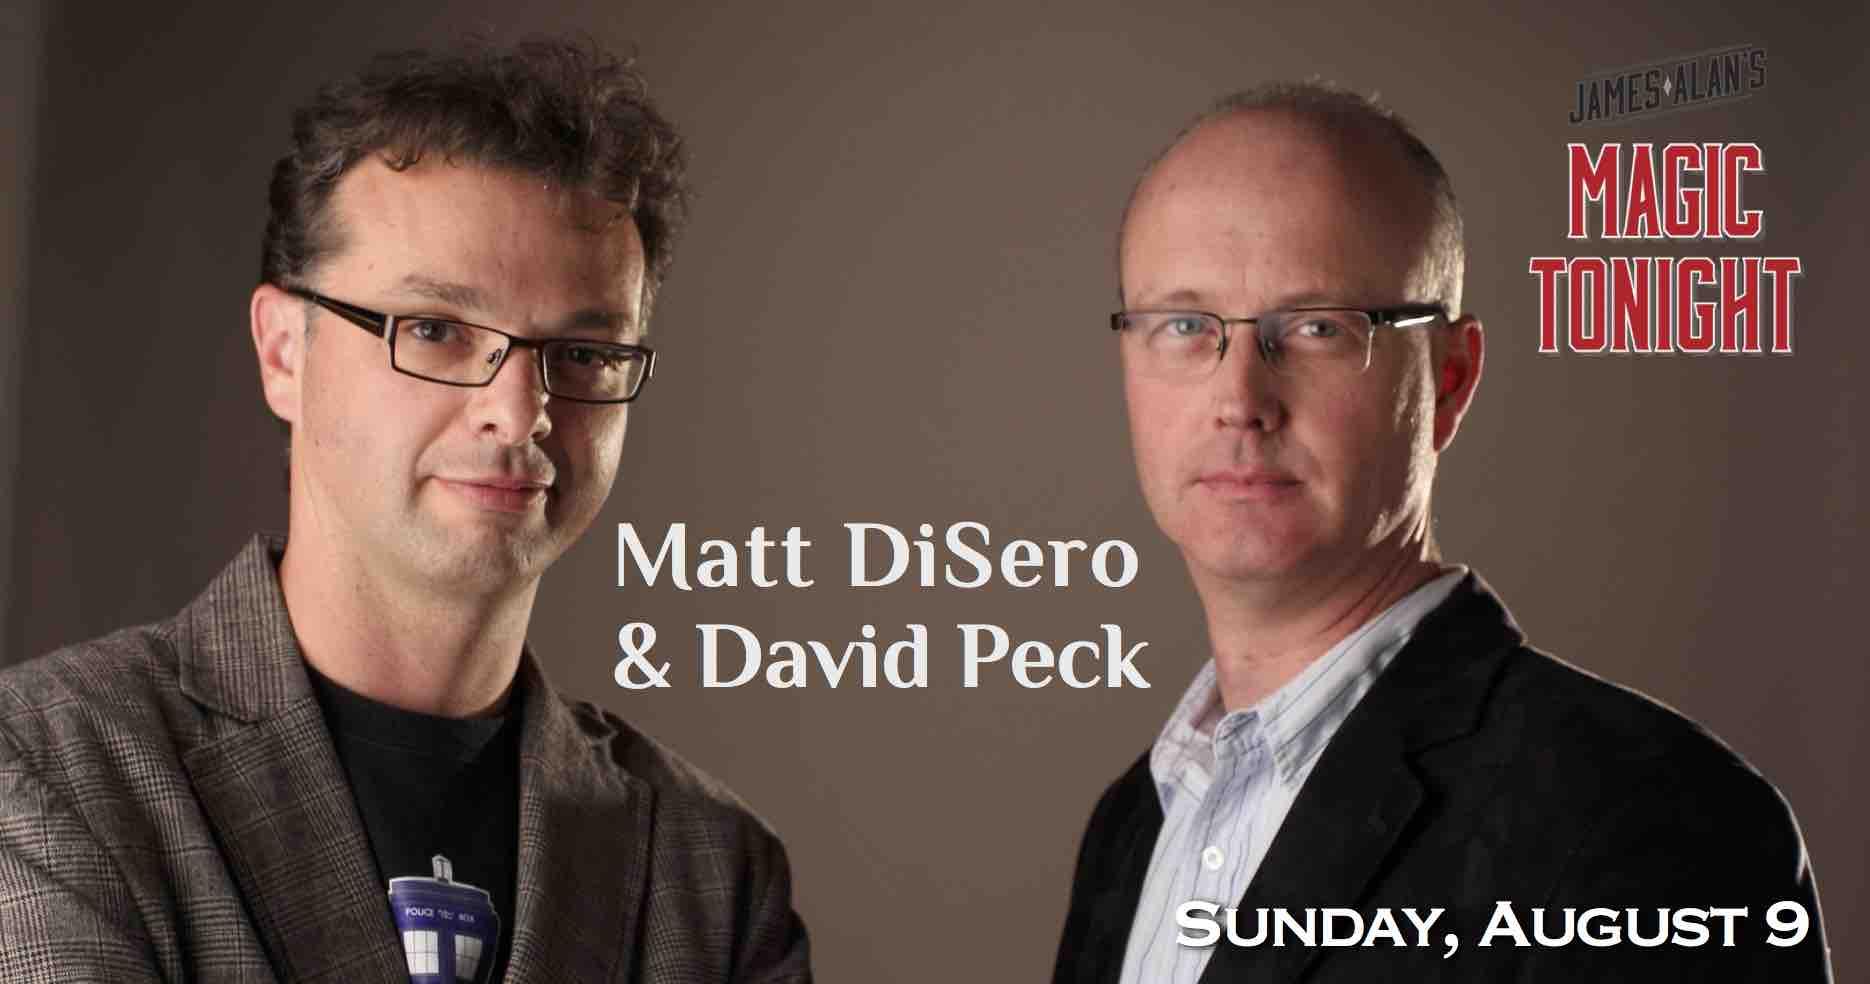 August 9 David Peck Matt DiSero